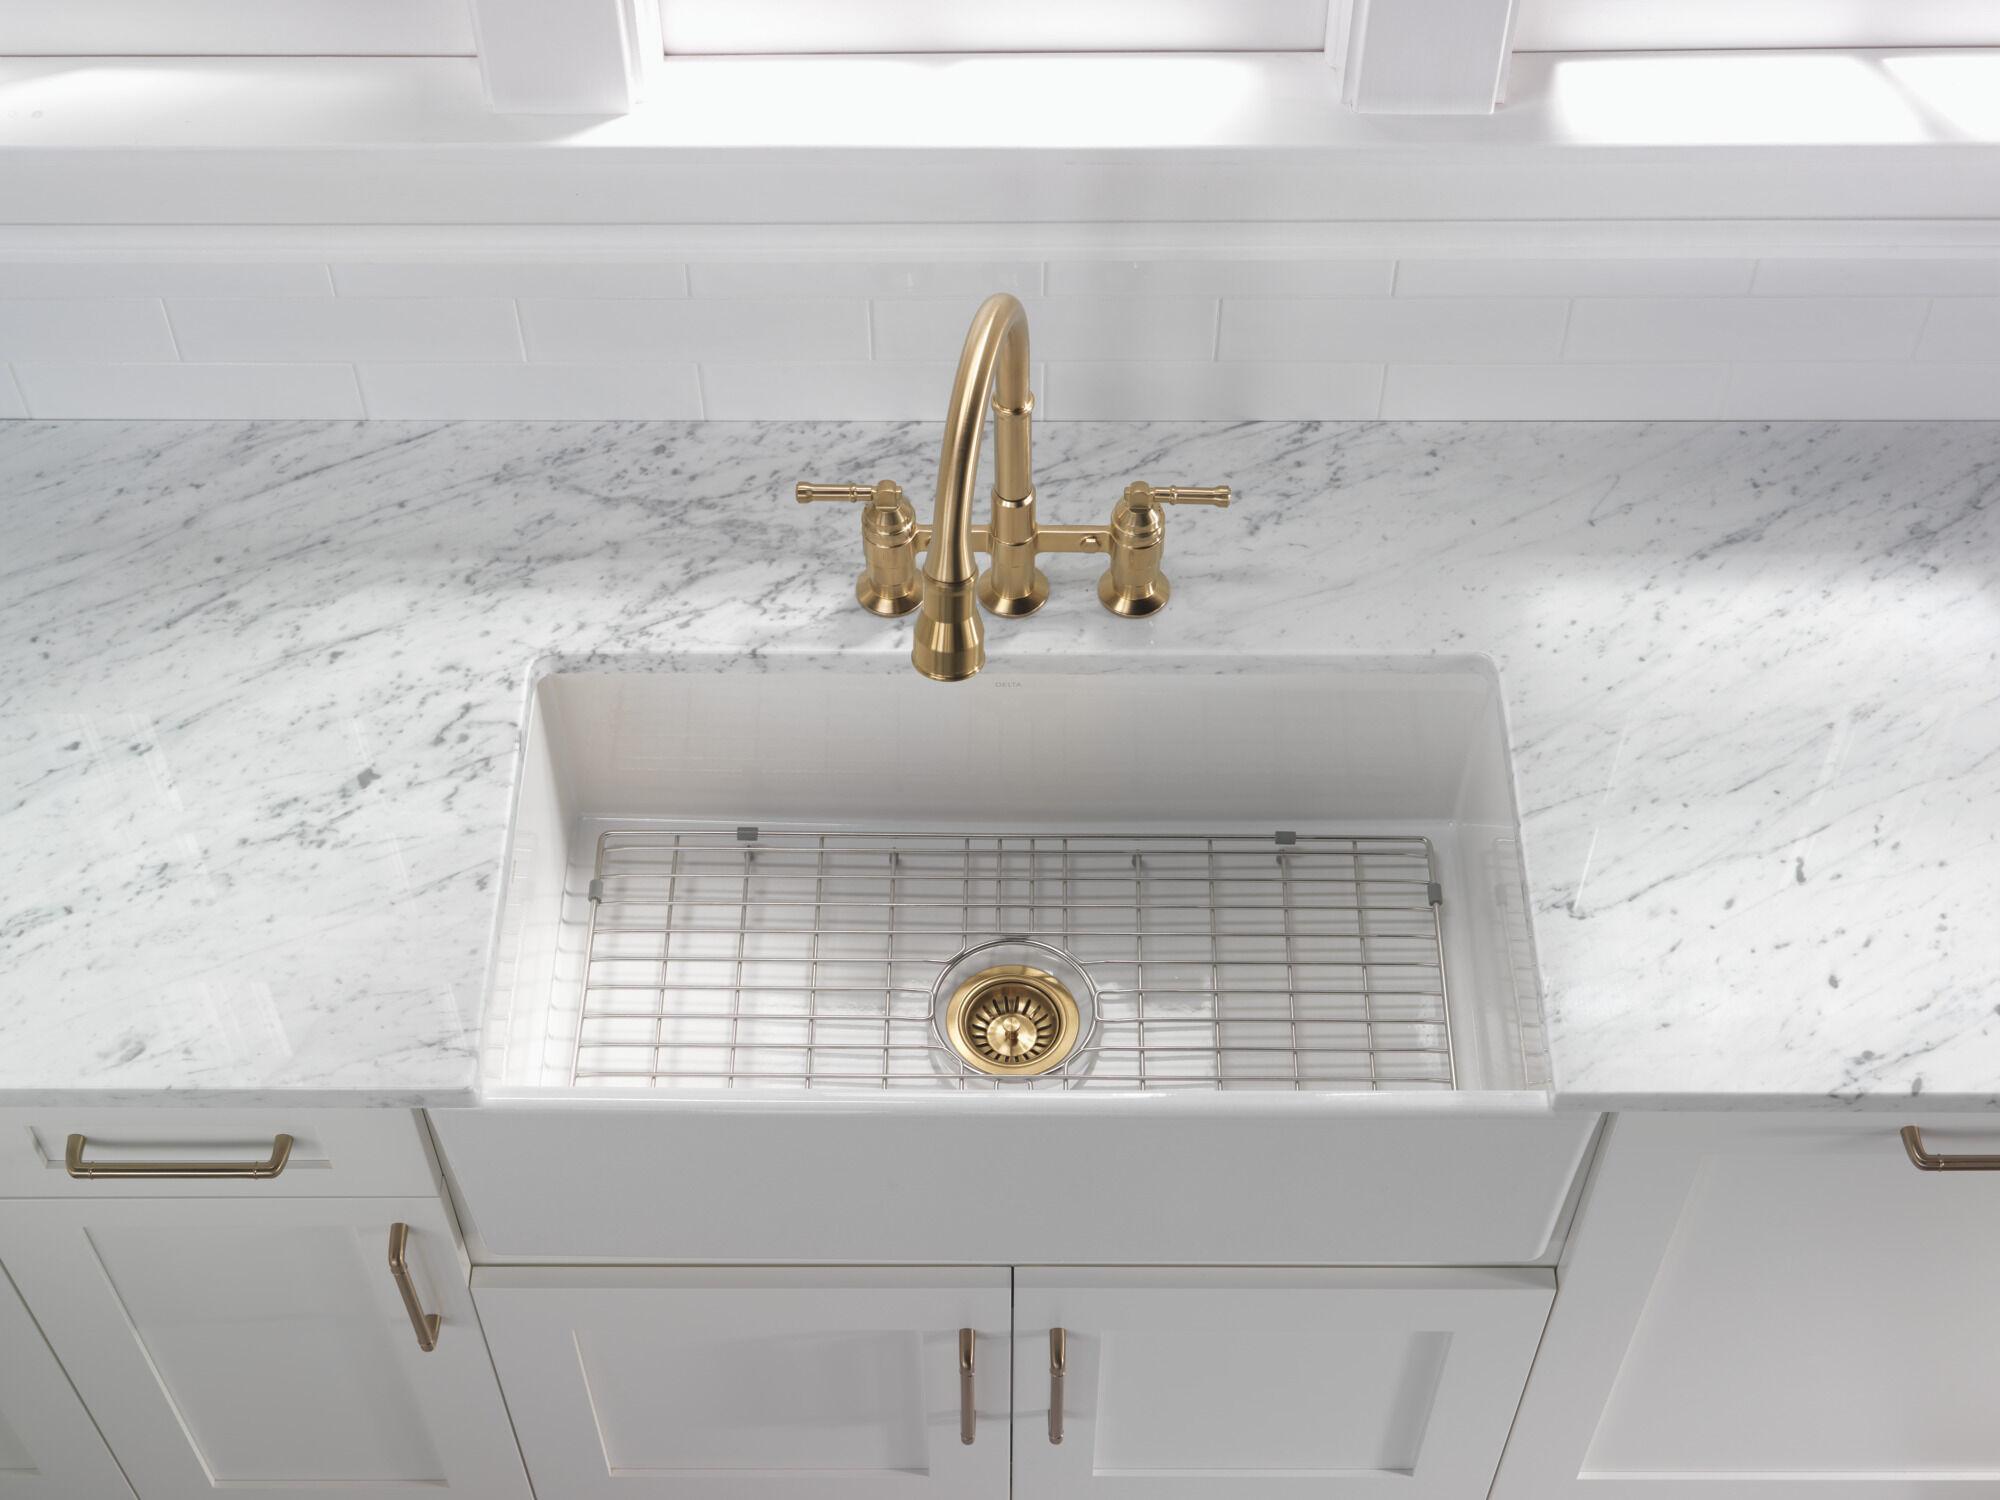 two handle pull down bridge kitchen faucet